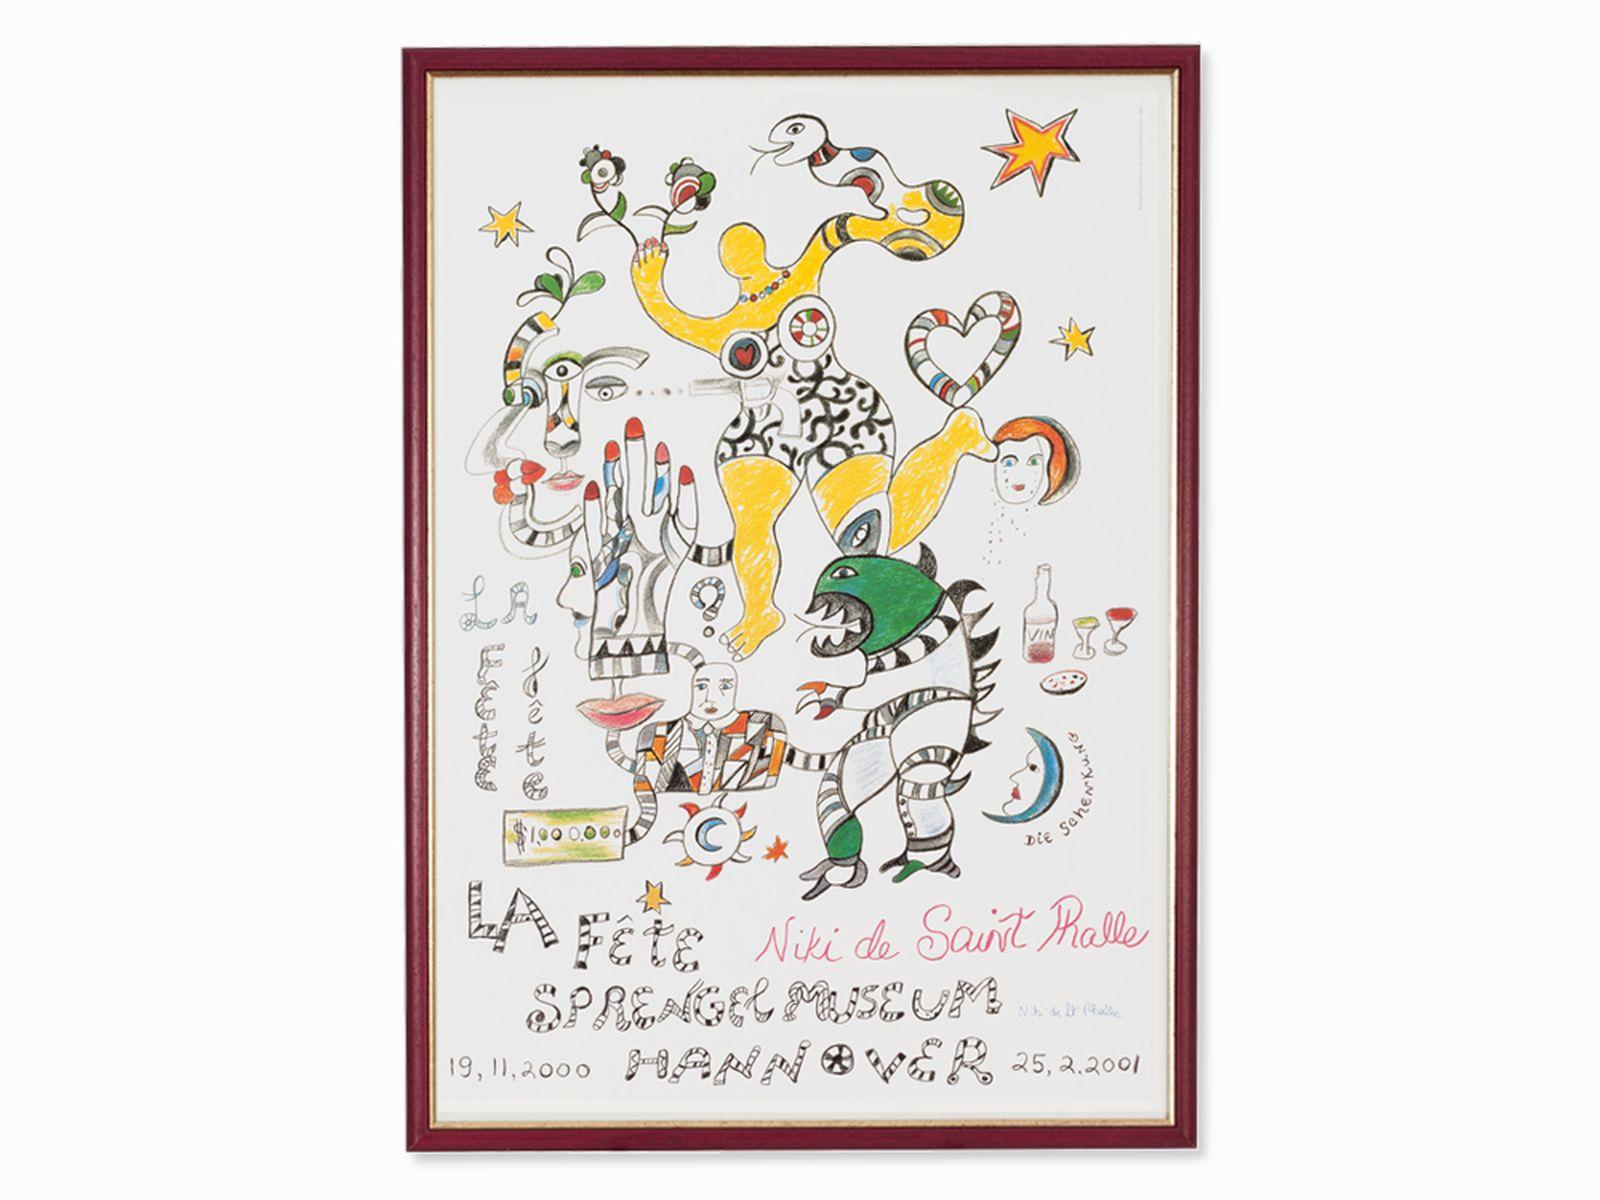 #64 Niki de Saint Phalle, poster Image